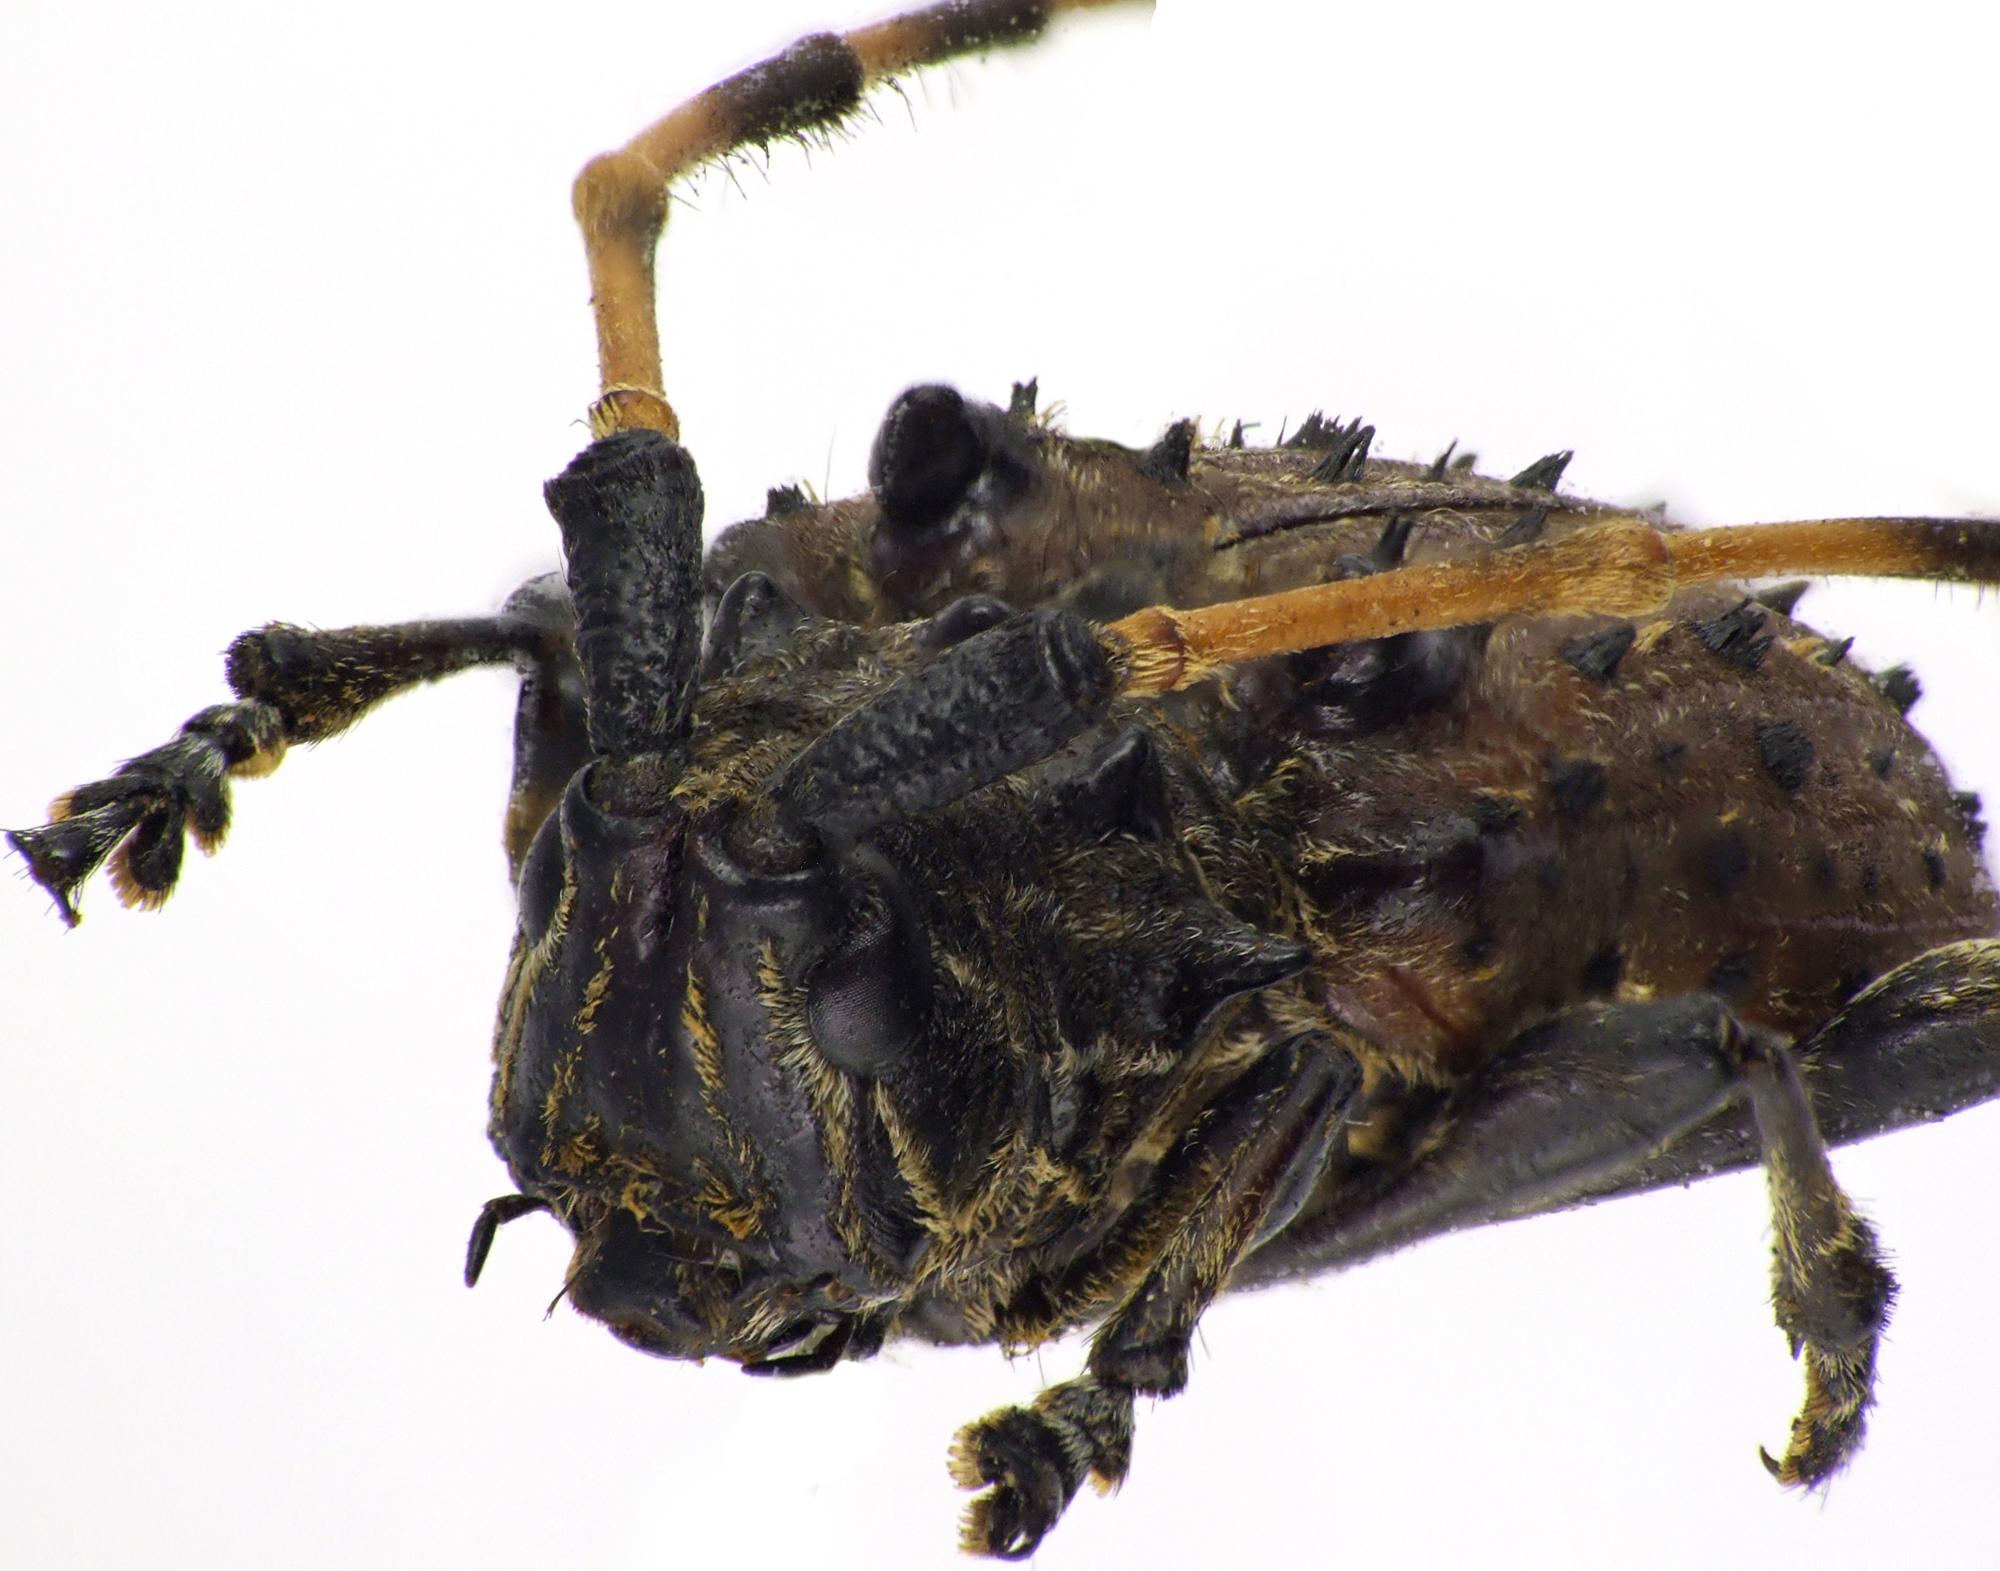 Callipyrga turrita NM60813cz24.jpg